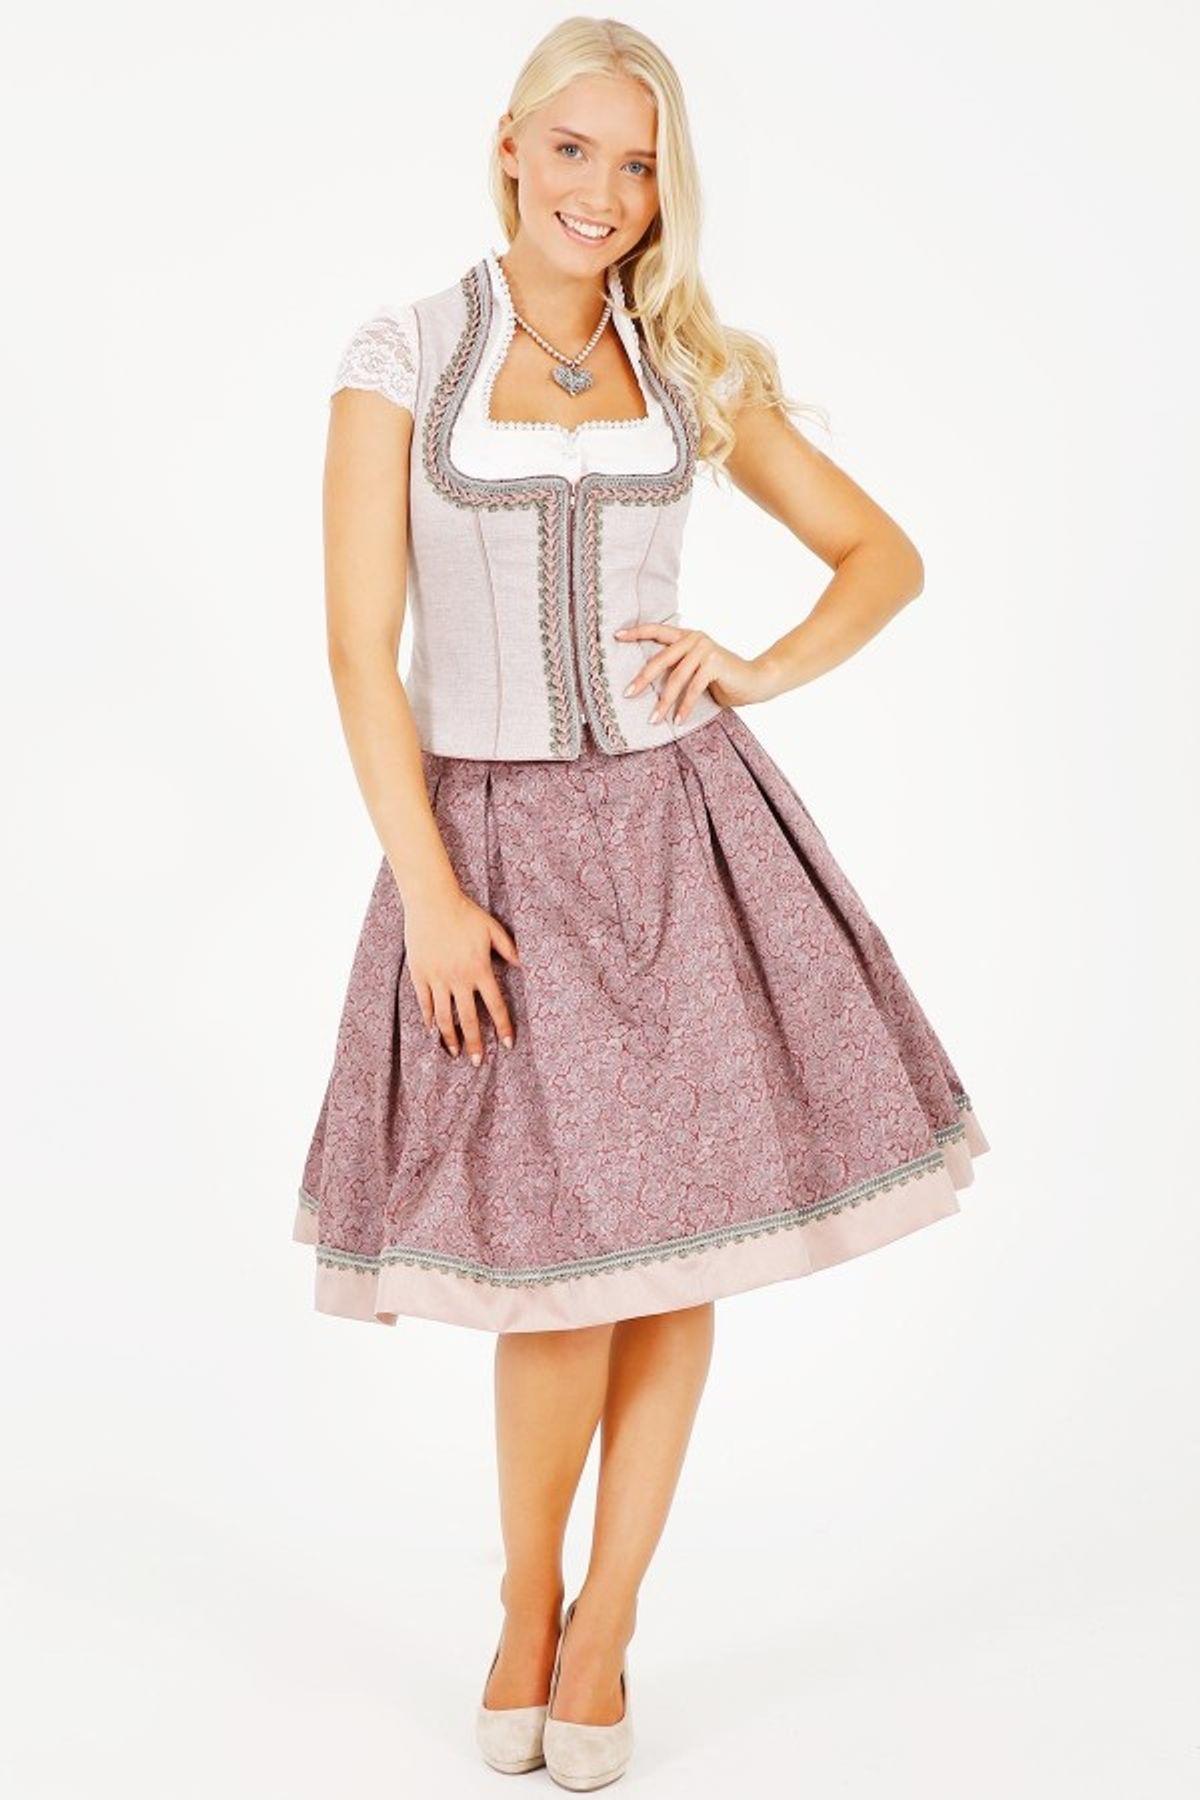 Krüger - Damen Trachtenrock in rosa,  Mary (25670-33) – Bild 2